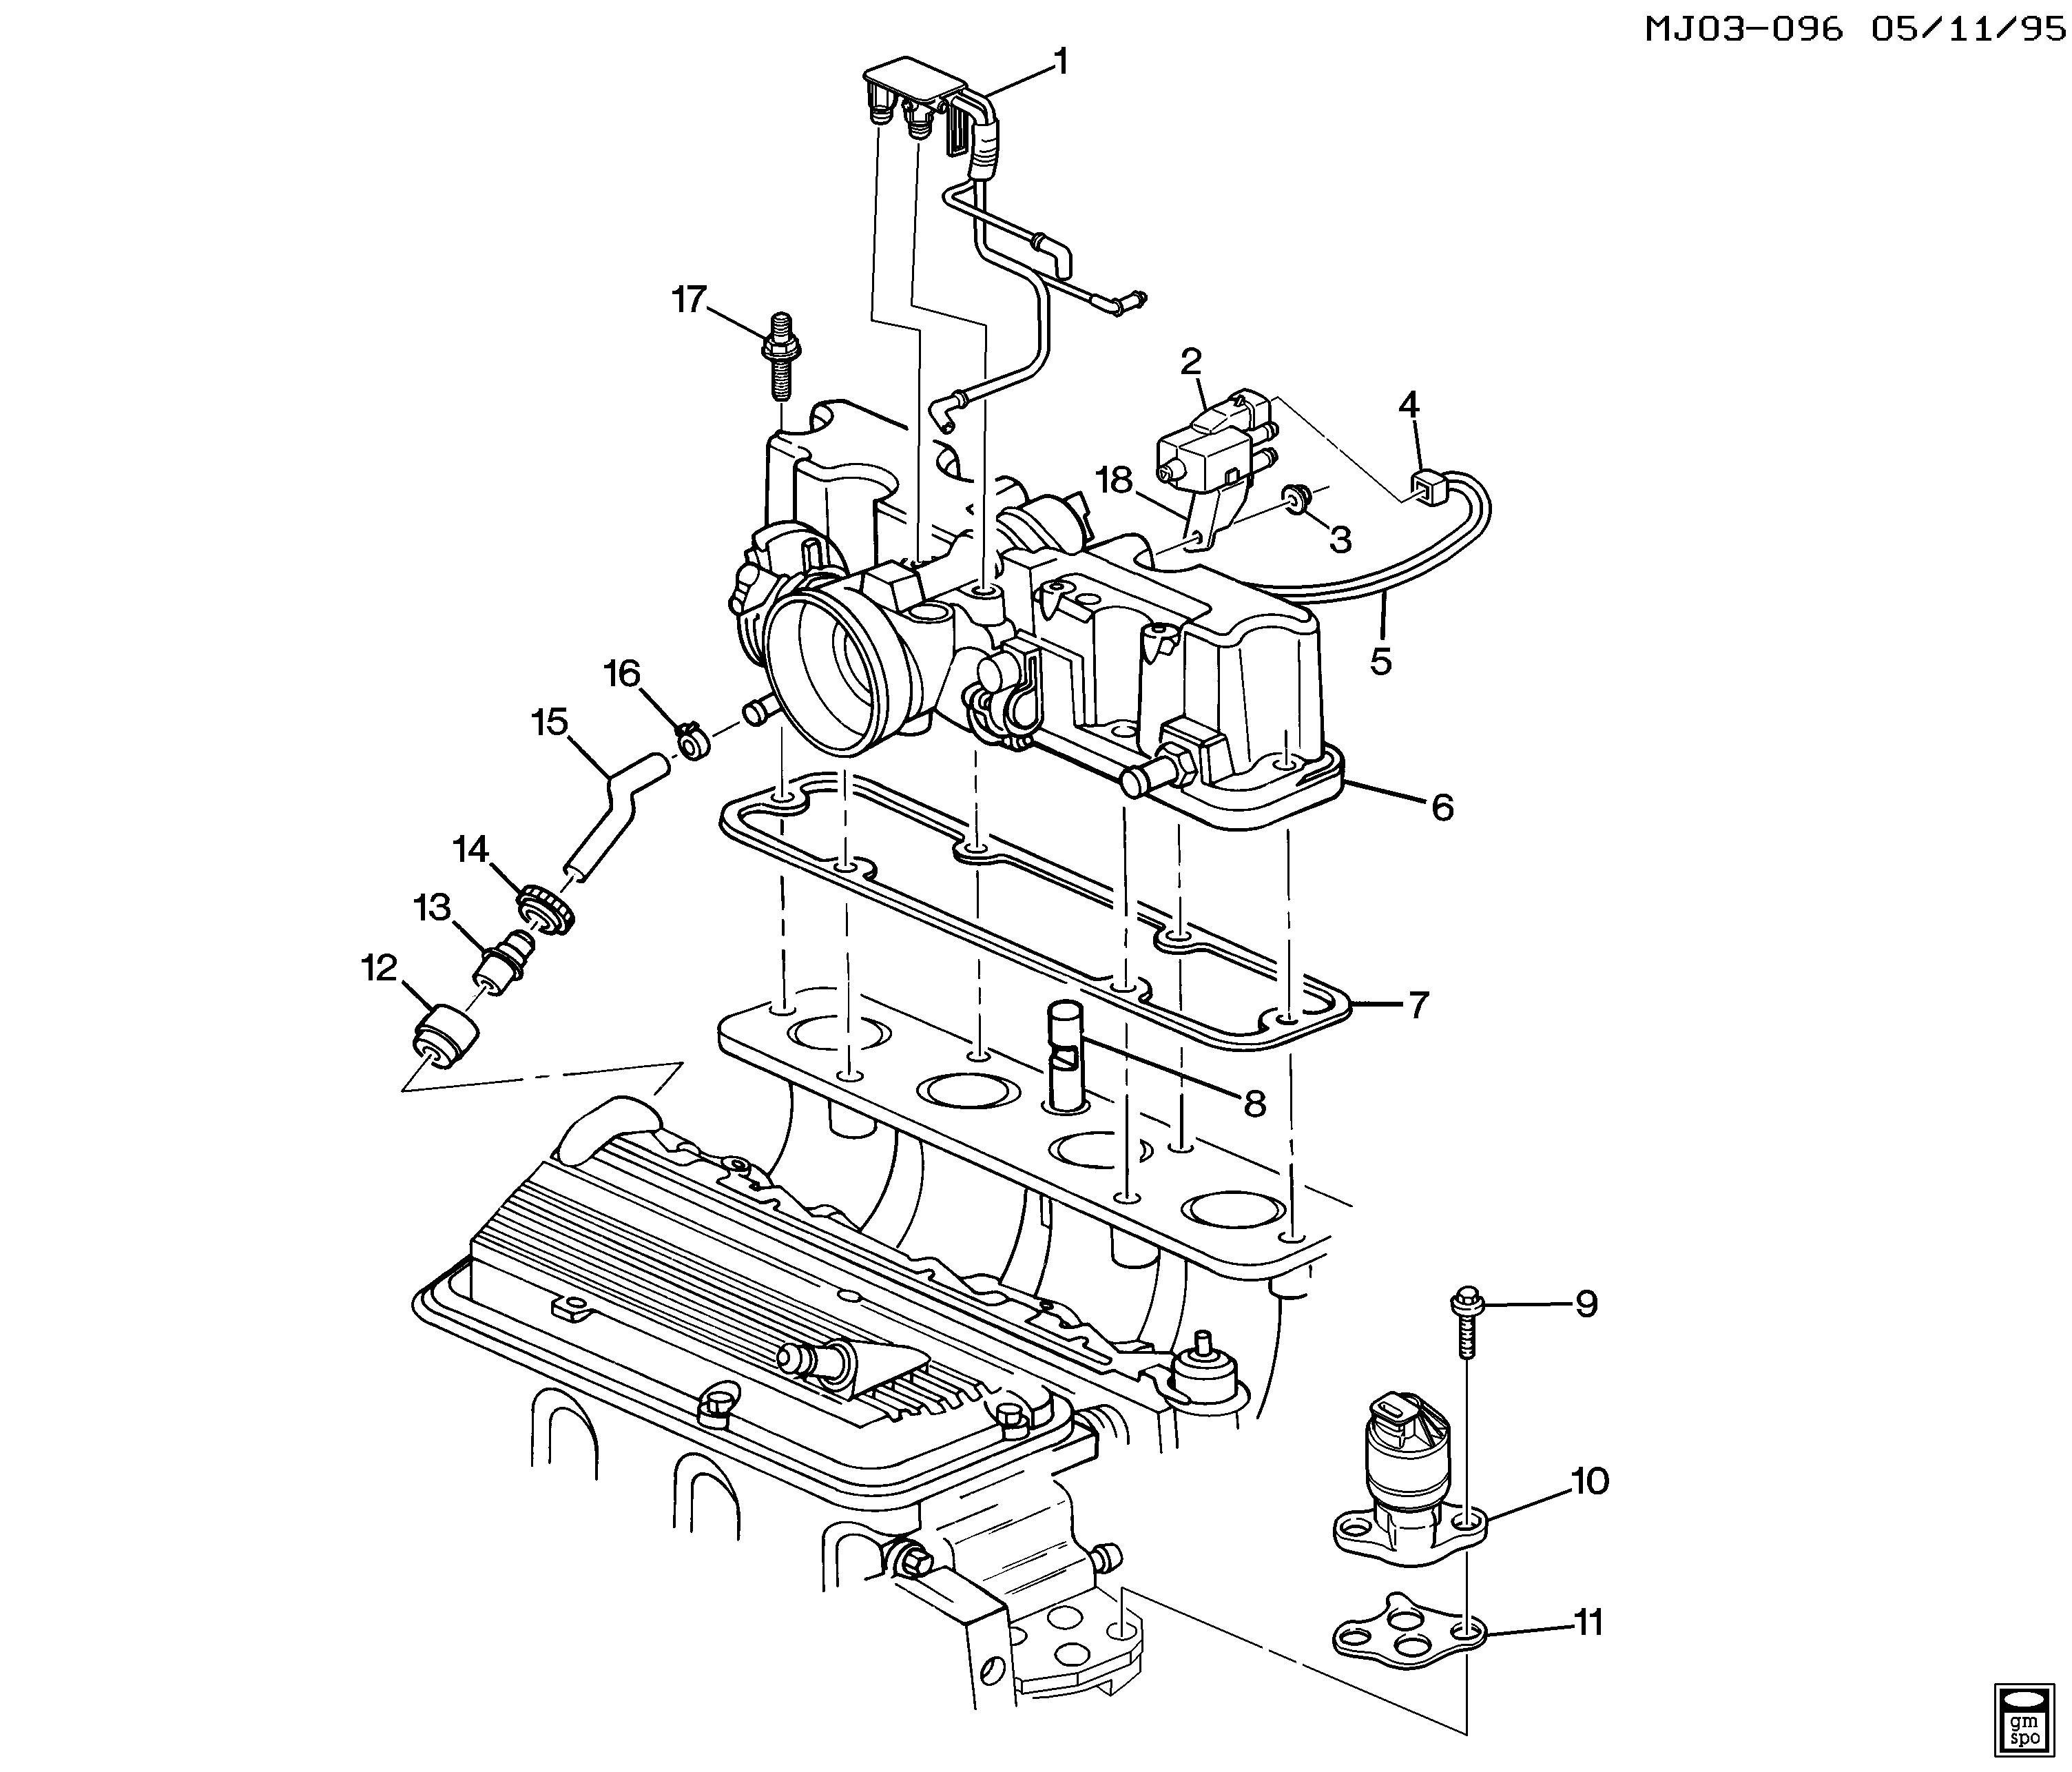 Pontiac       Sunfire     J EGR VALVE   RELATED PARTS  LN222